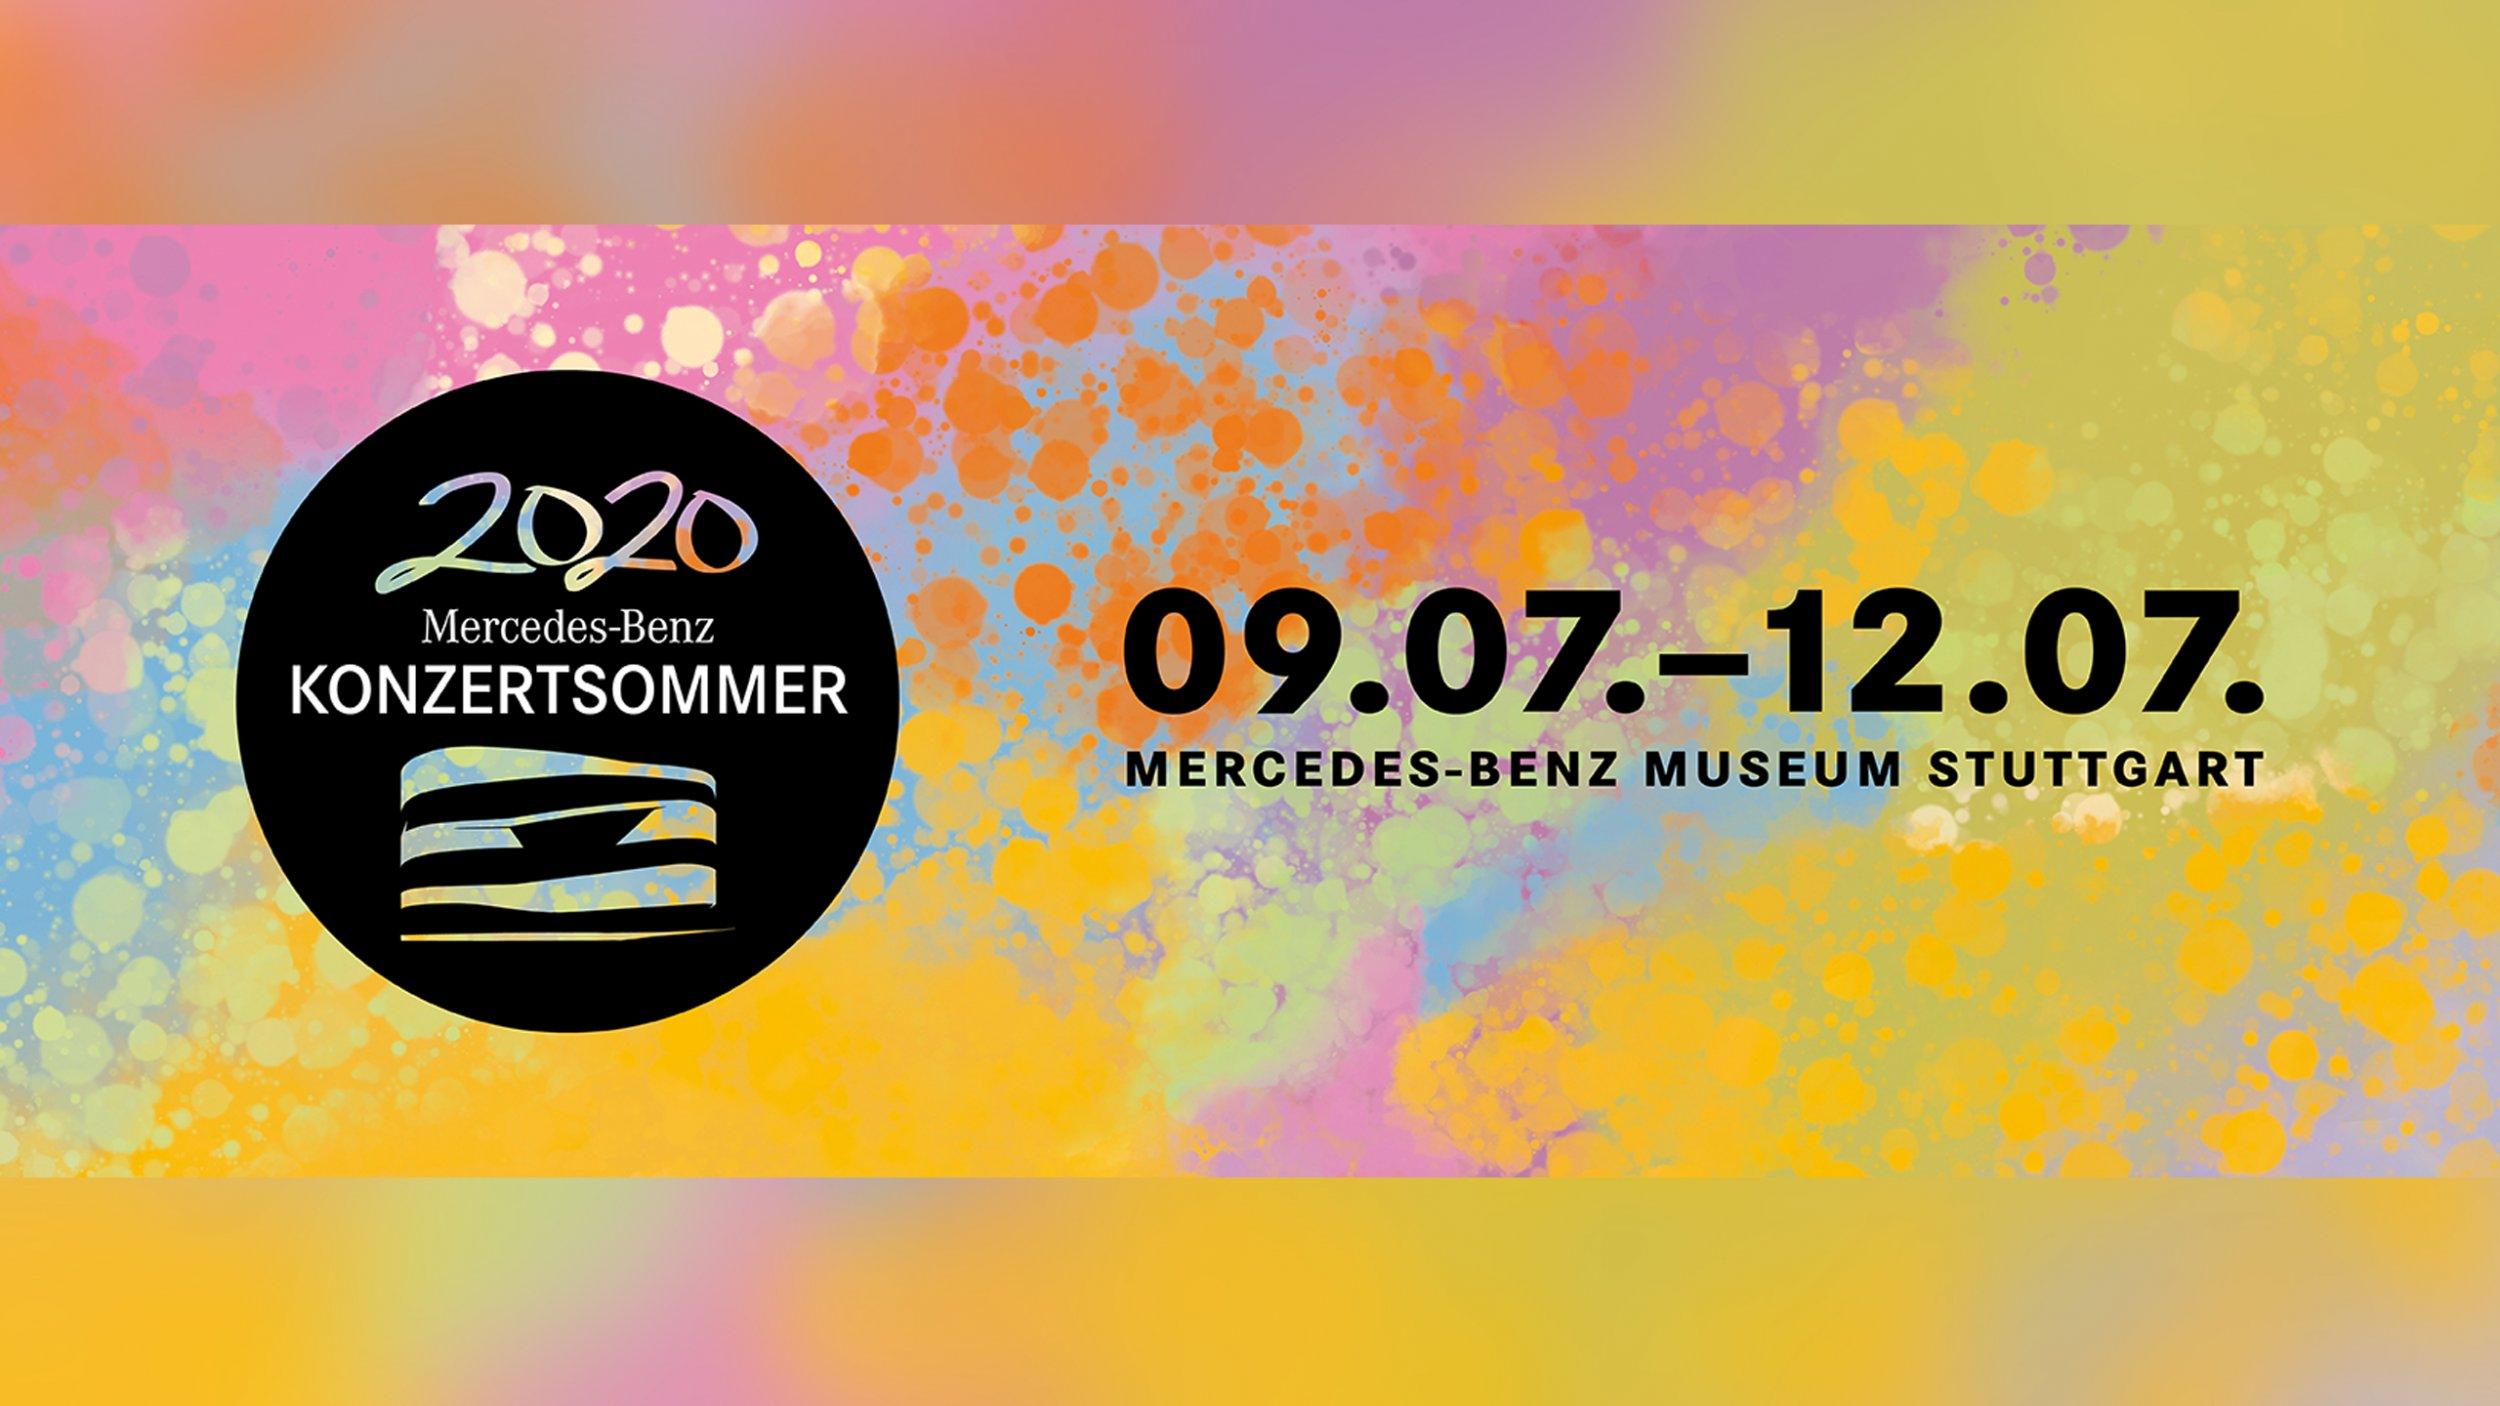 https://cloud.mb-lounge.com/files/HQ-Events/Classic/Museum/event-calendar-concert-concert-summer-2560x1440.jpg